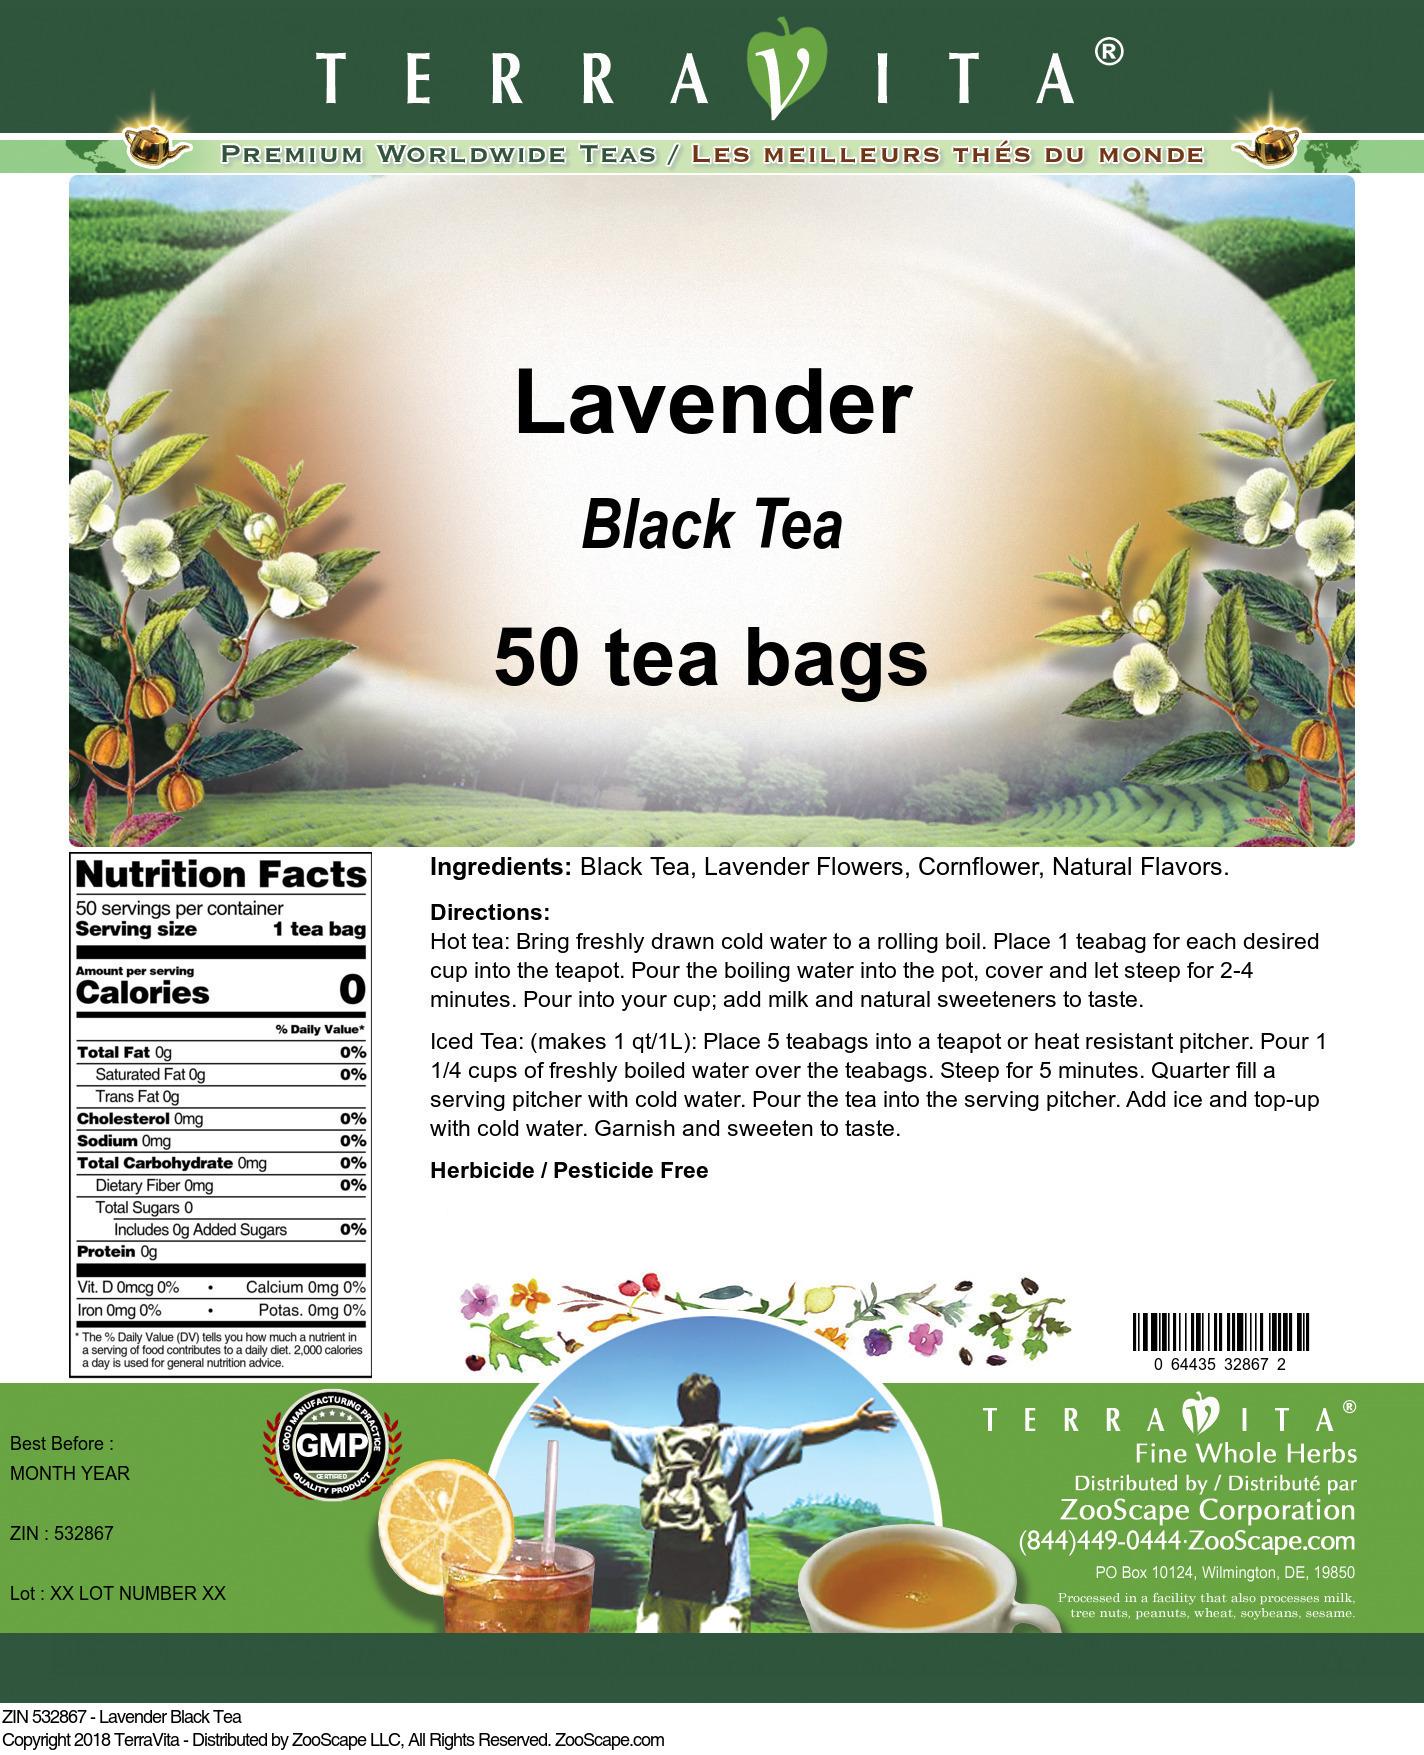 Lavender Black Tea